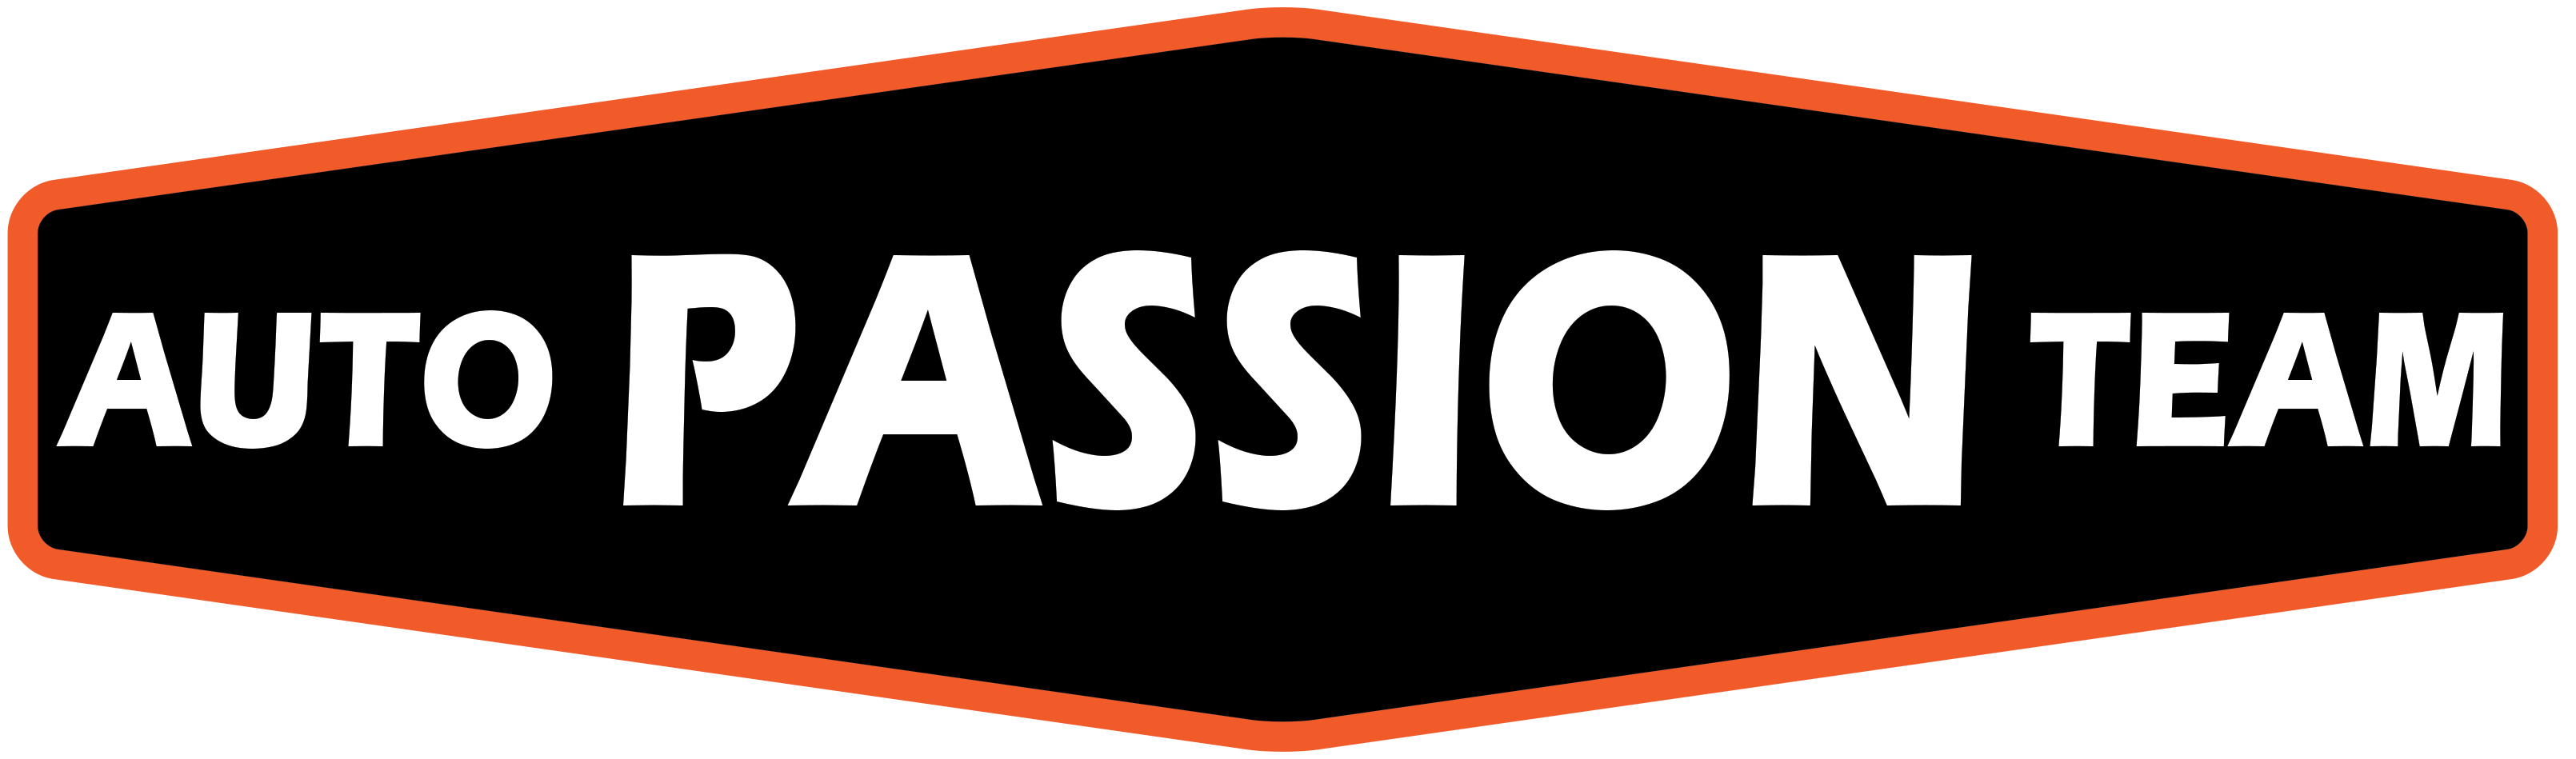 Auto Passion Team